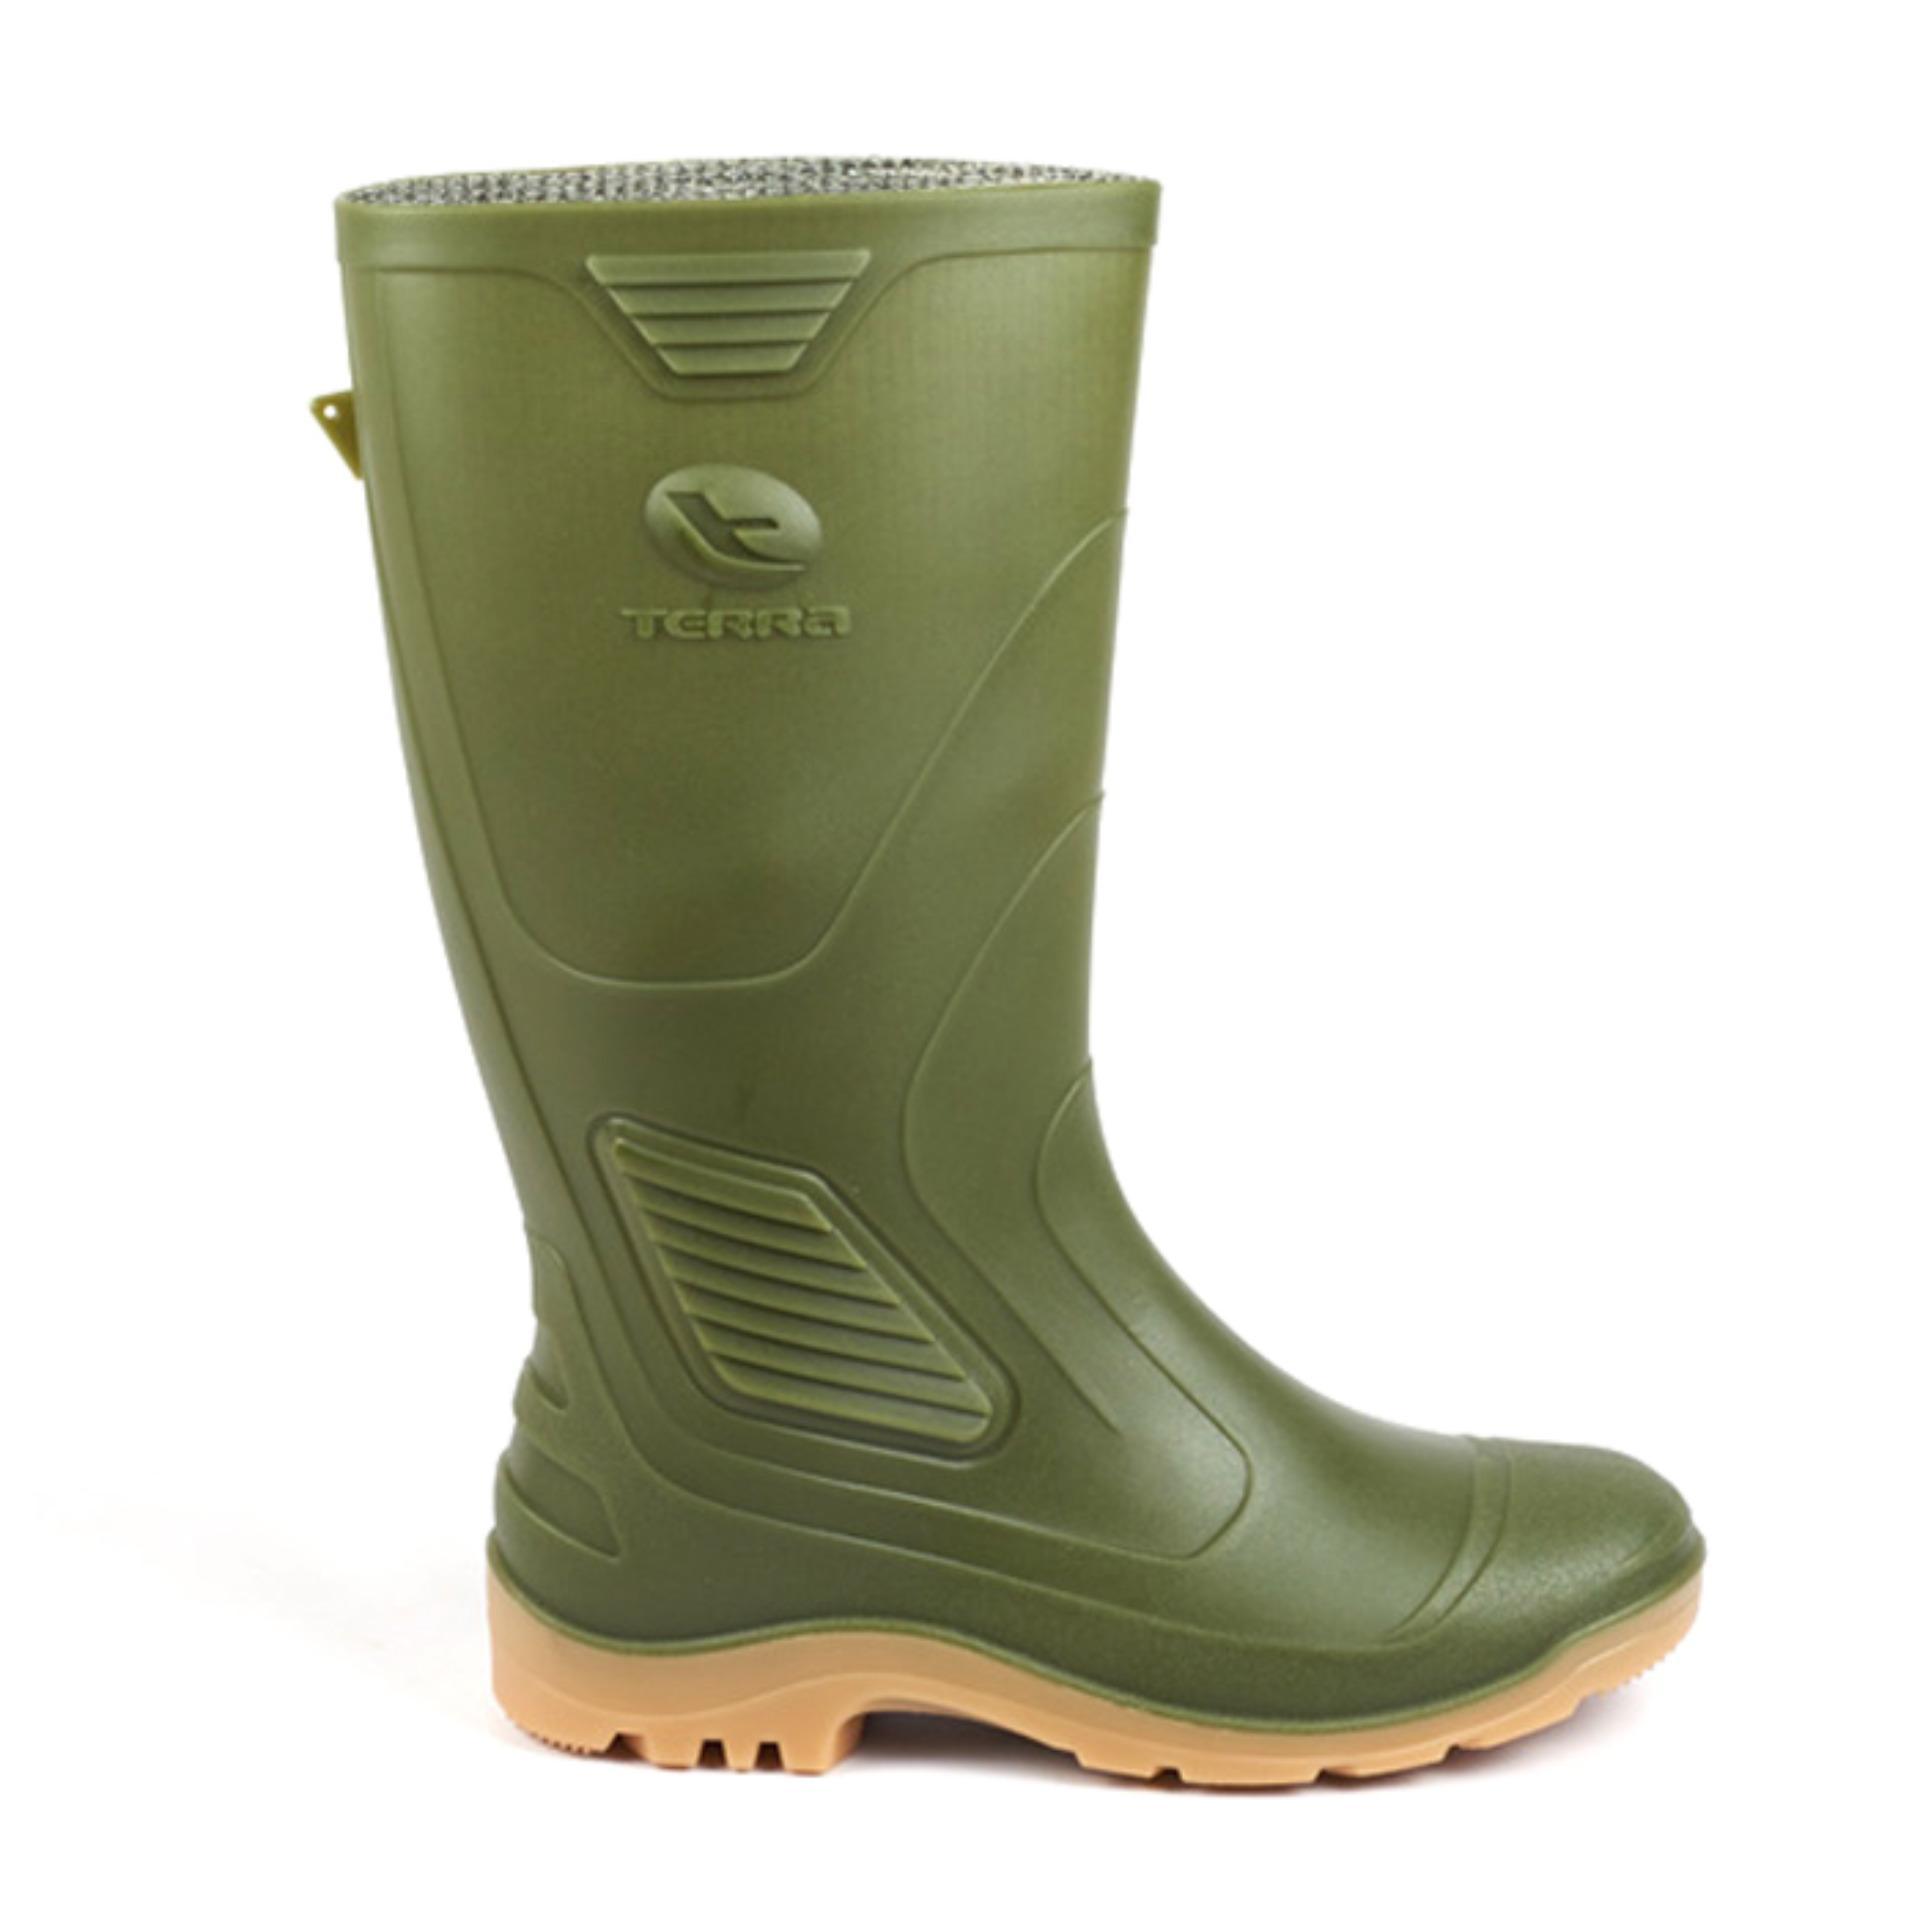 Toko Ap Boots Sepatu Kerja Slop Waterproof Ap Terra Eco 3 Yang Bisa Kredit